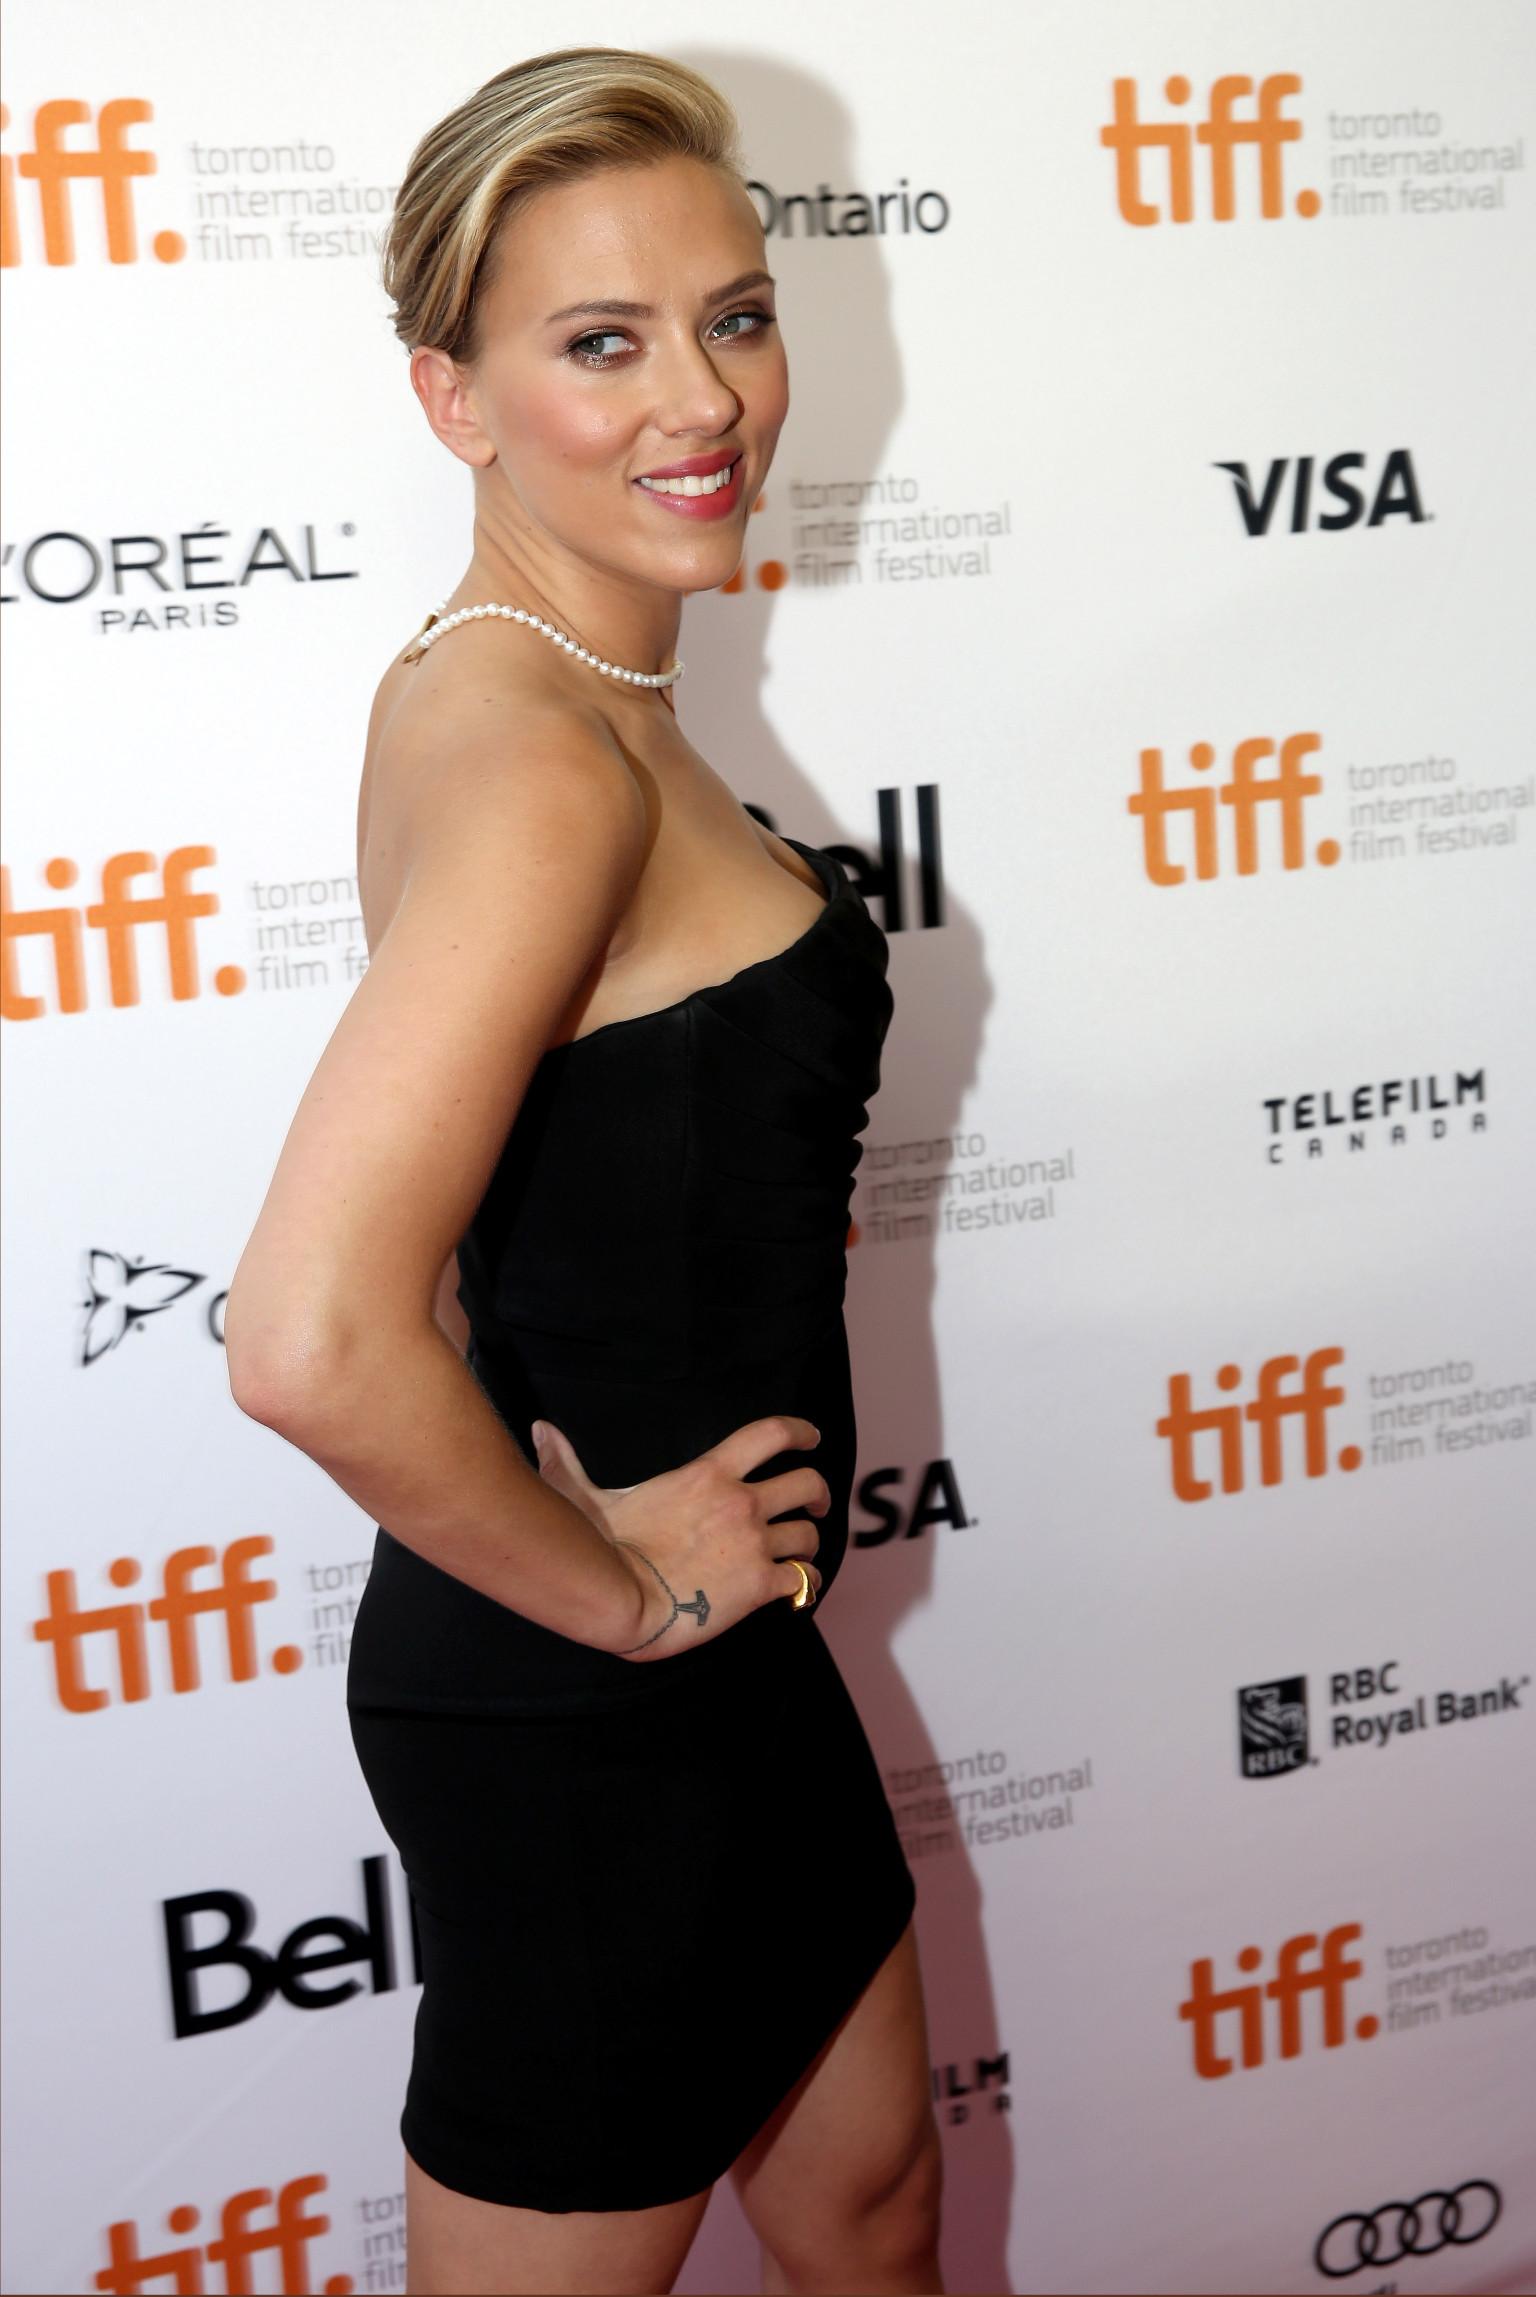 Scarlett Johansson Wears Tiny Black Dress, Pearls To 'Don Jon ...